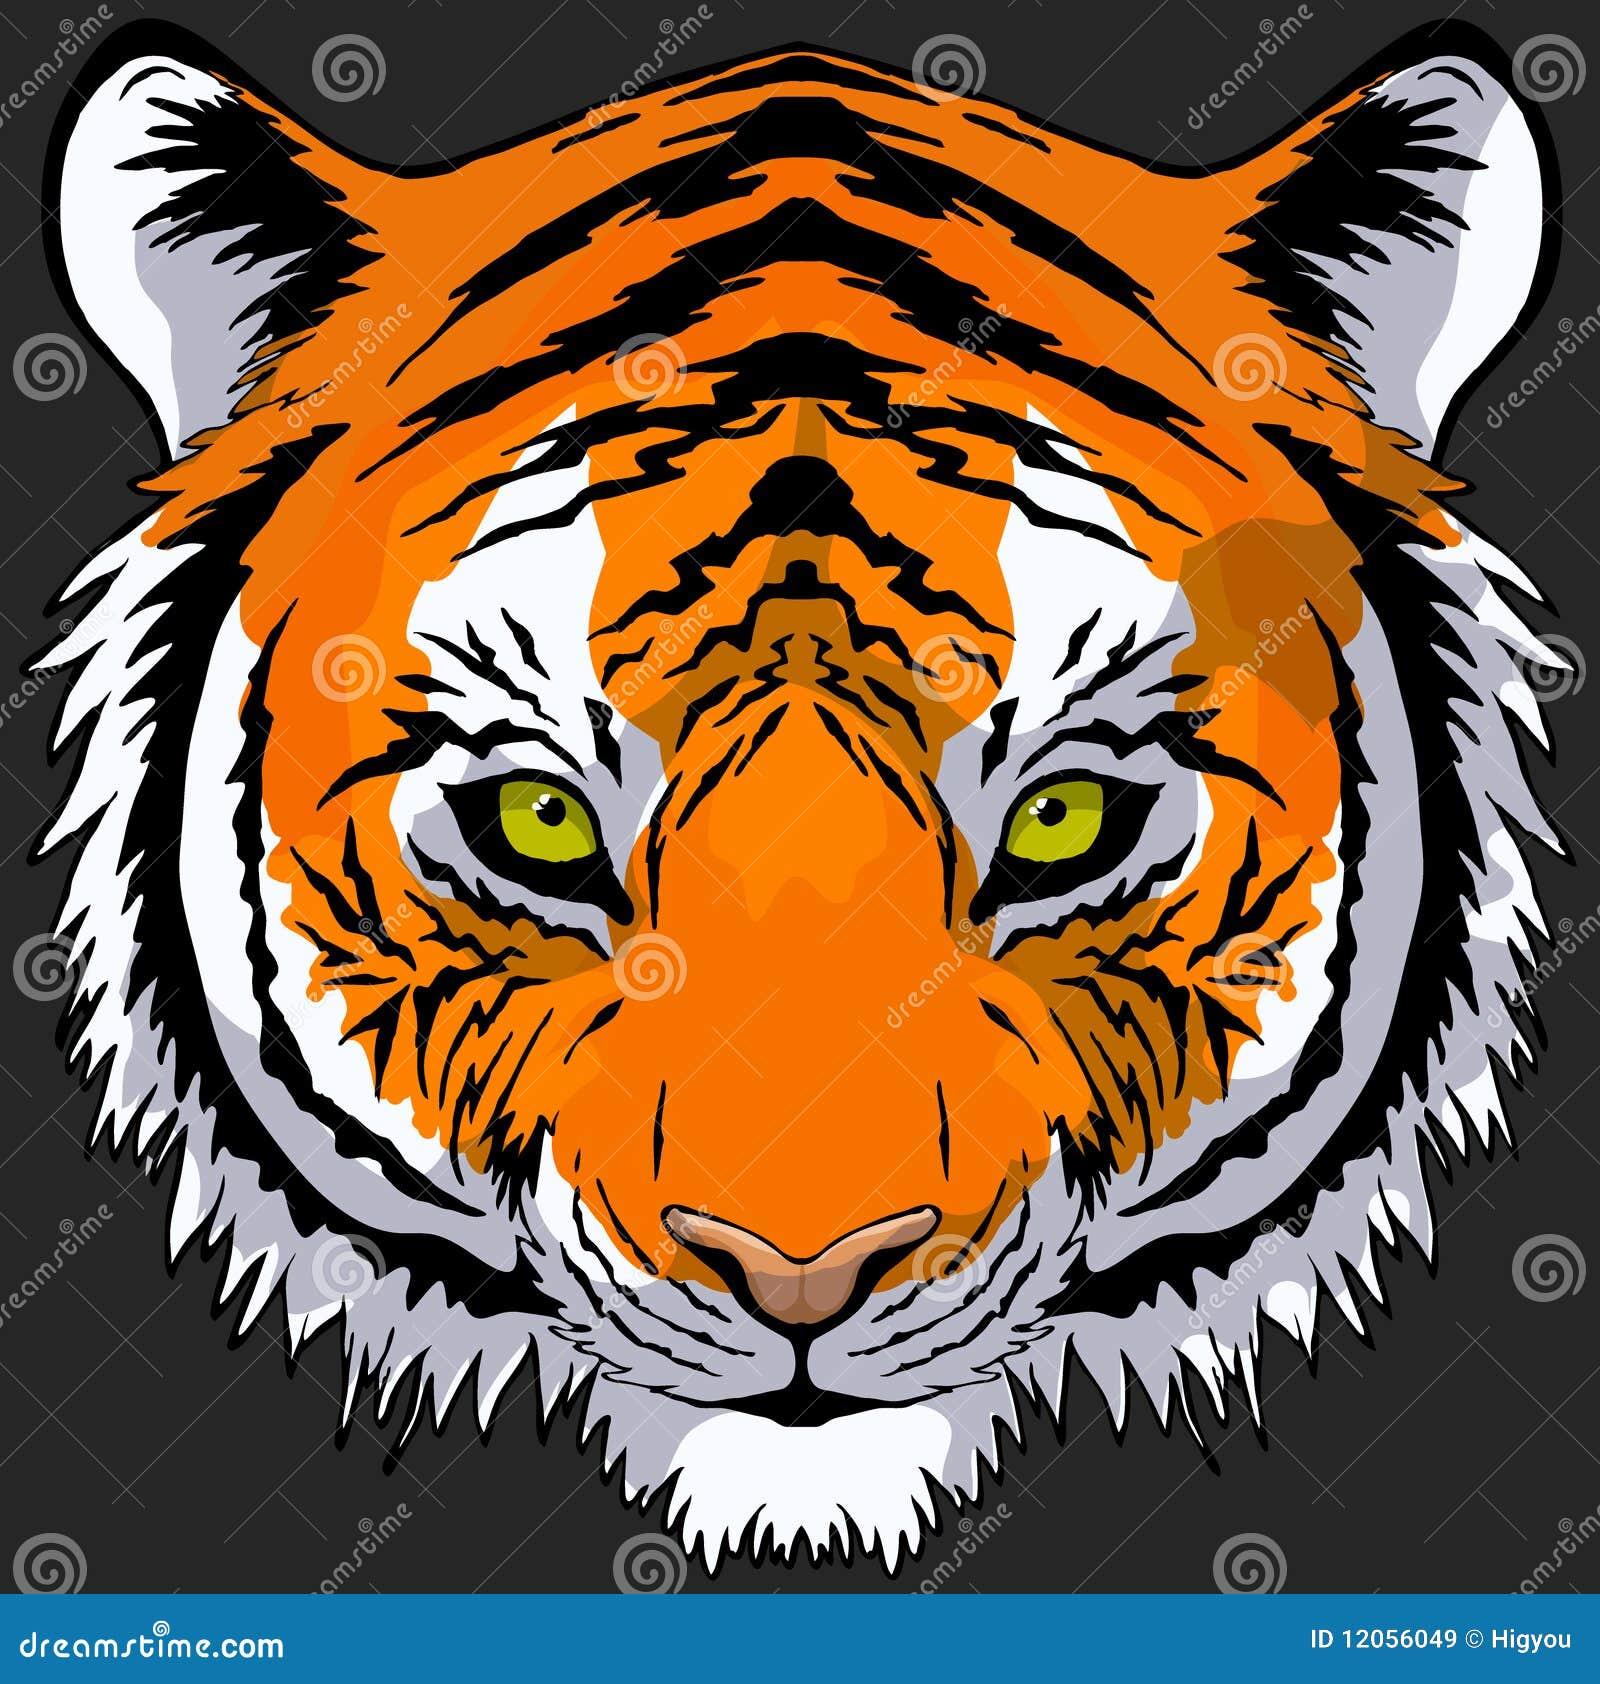 Tiger head drawing - photo#14